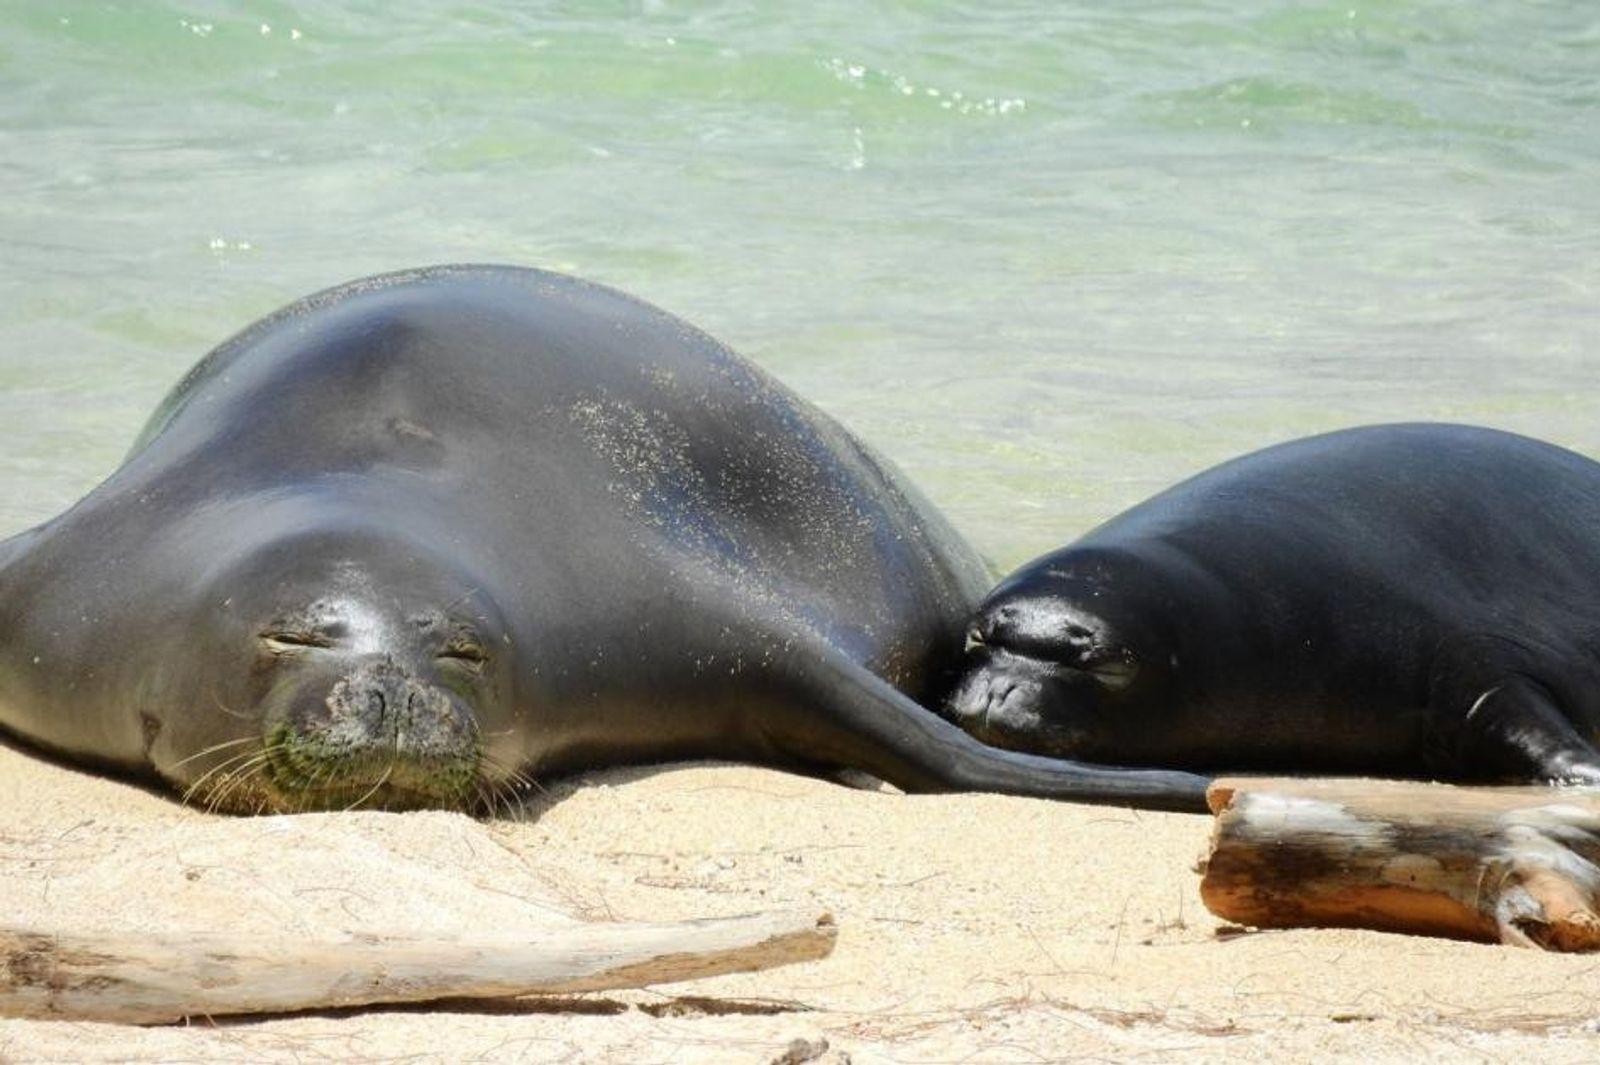 Parasita da areia do gato está destruindo a foca mais rara da Terra